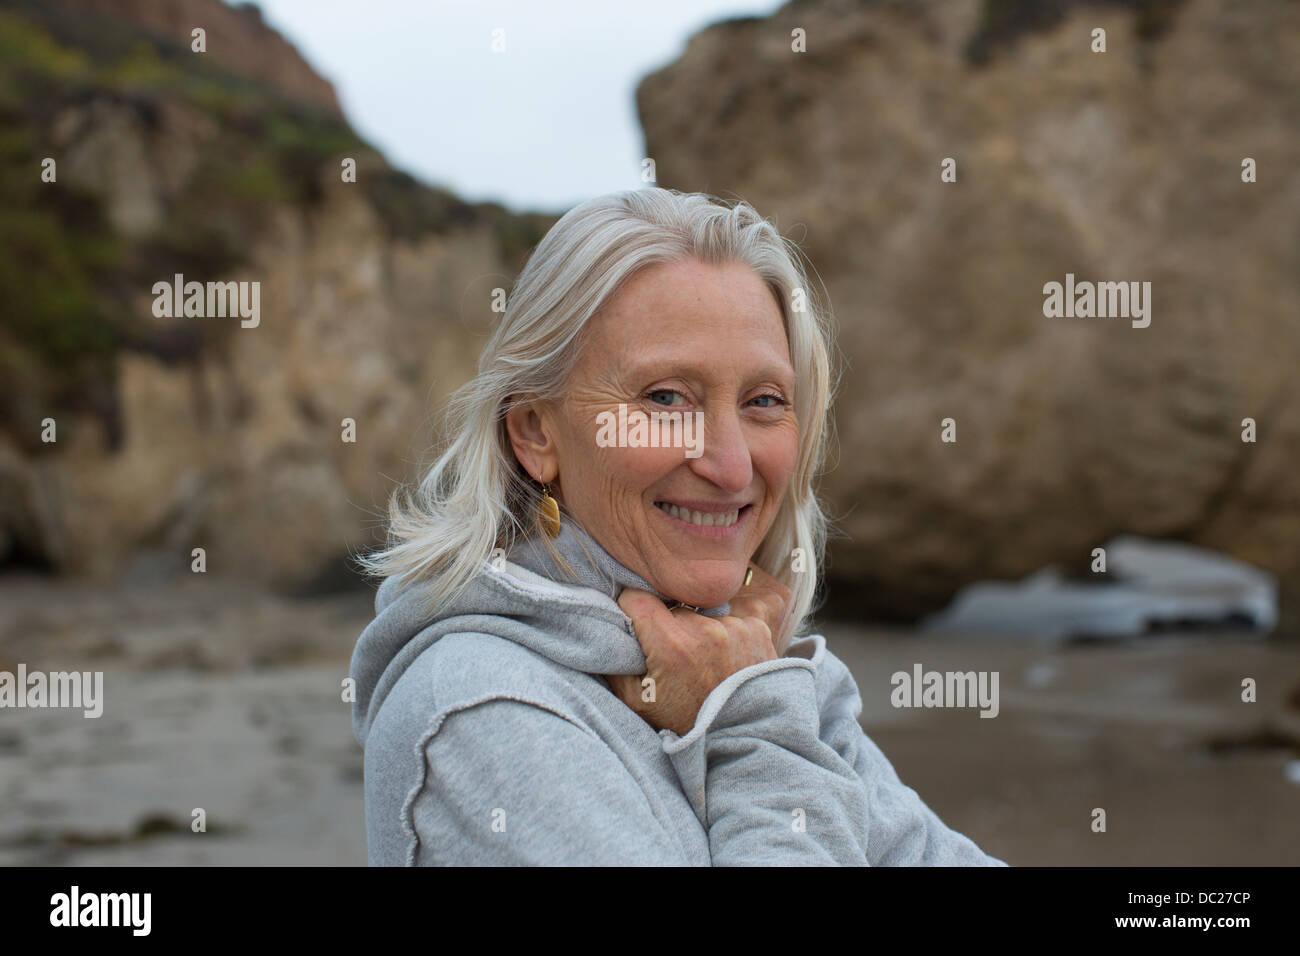 Mature woman wearing grey sweater on beach, smiling Stock Photo